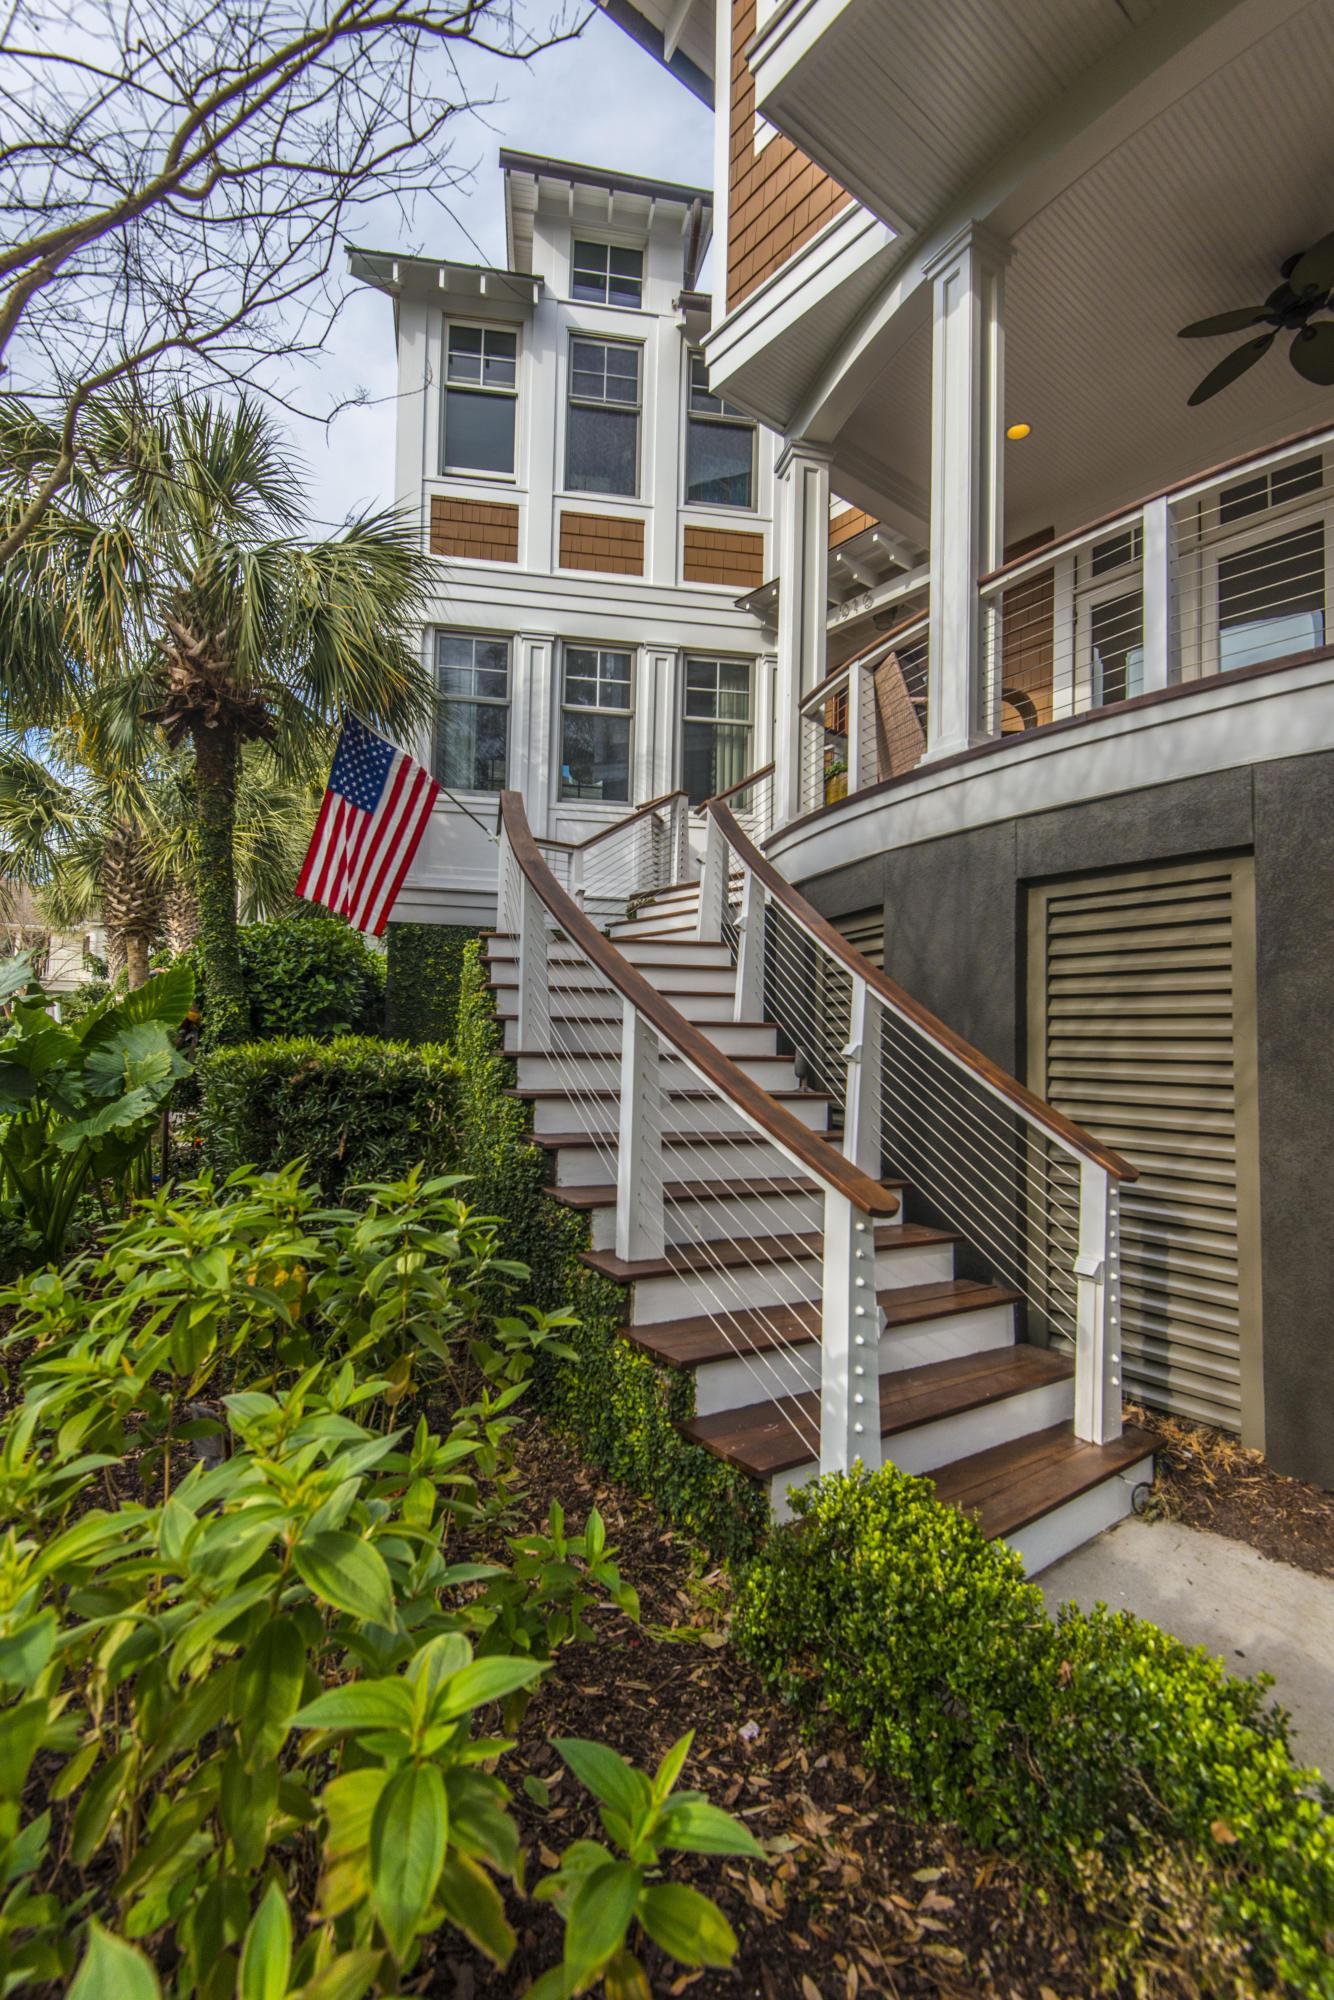 Saltgrass Pointe Homes For Sale - 916 Mciver, Mount Pleasant, SC - 30